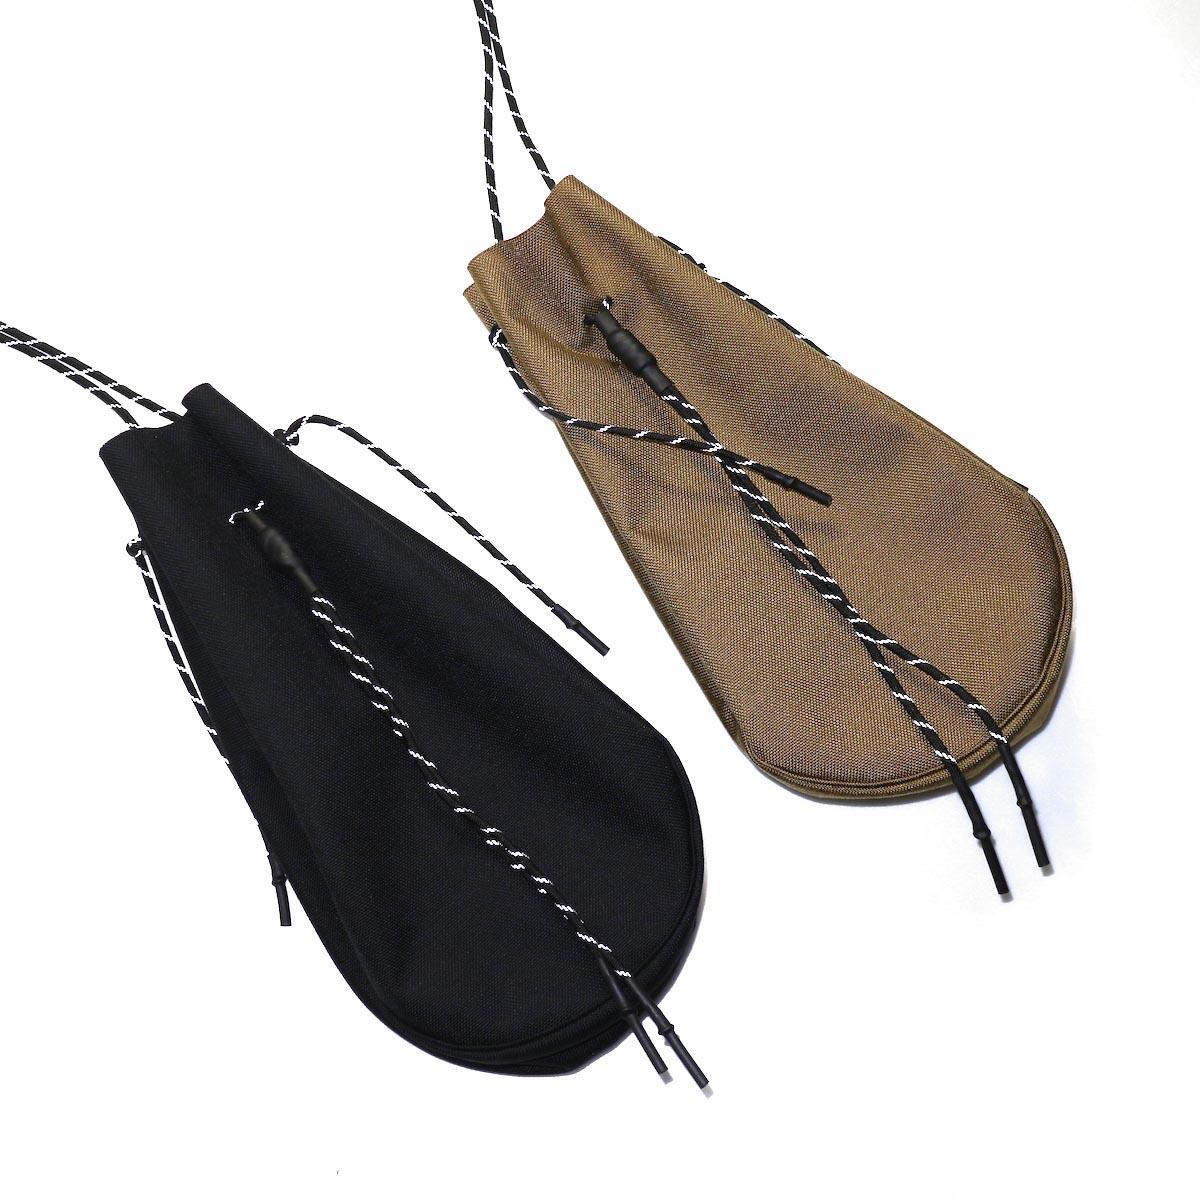 吉岡衣料店 / drawstring bag -L-. Black,coyote 2色